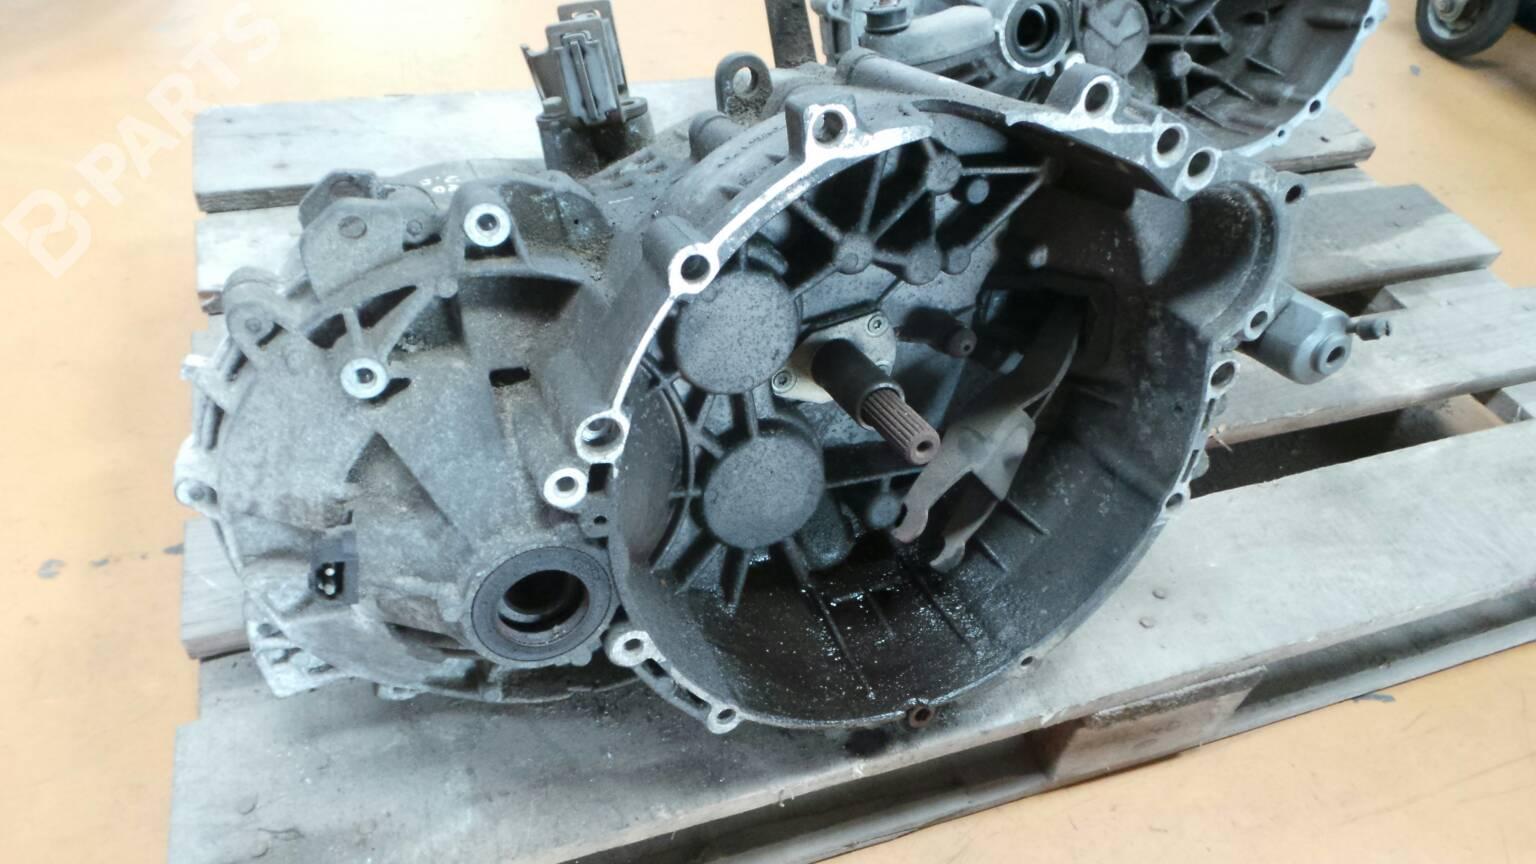 Manual Gearbox Volvo 850 854 20 Turbo 28328 1994 Engine Schematics 023183 179hp B 5204